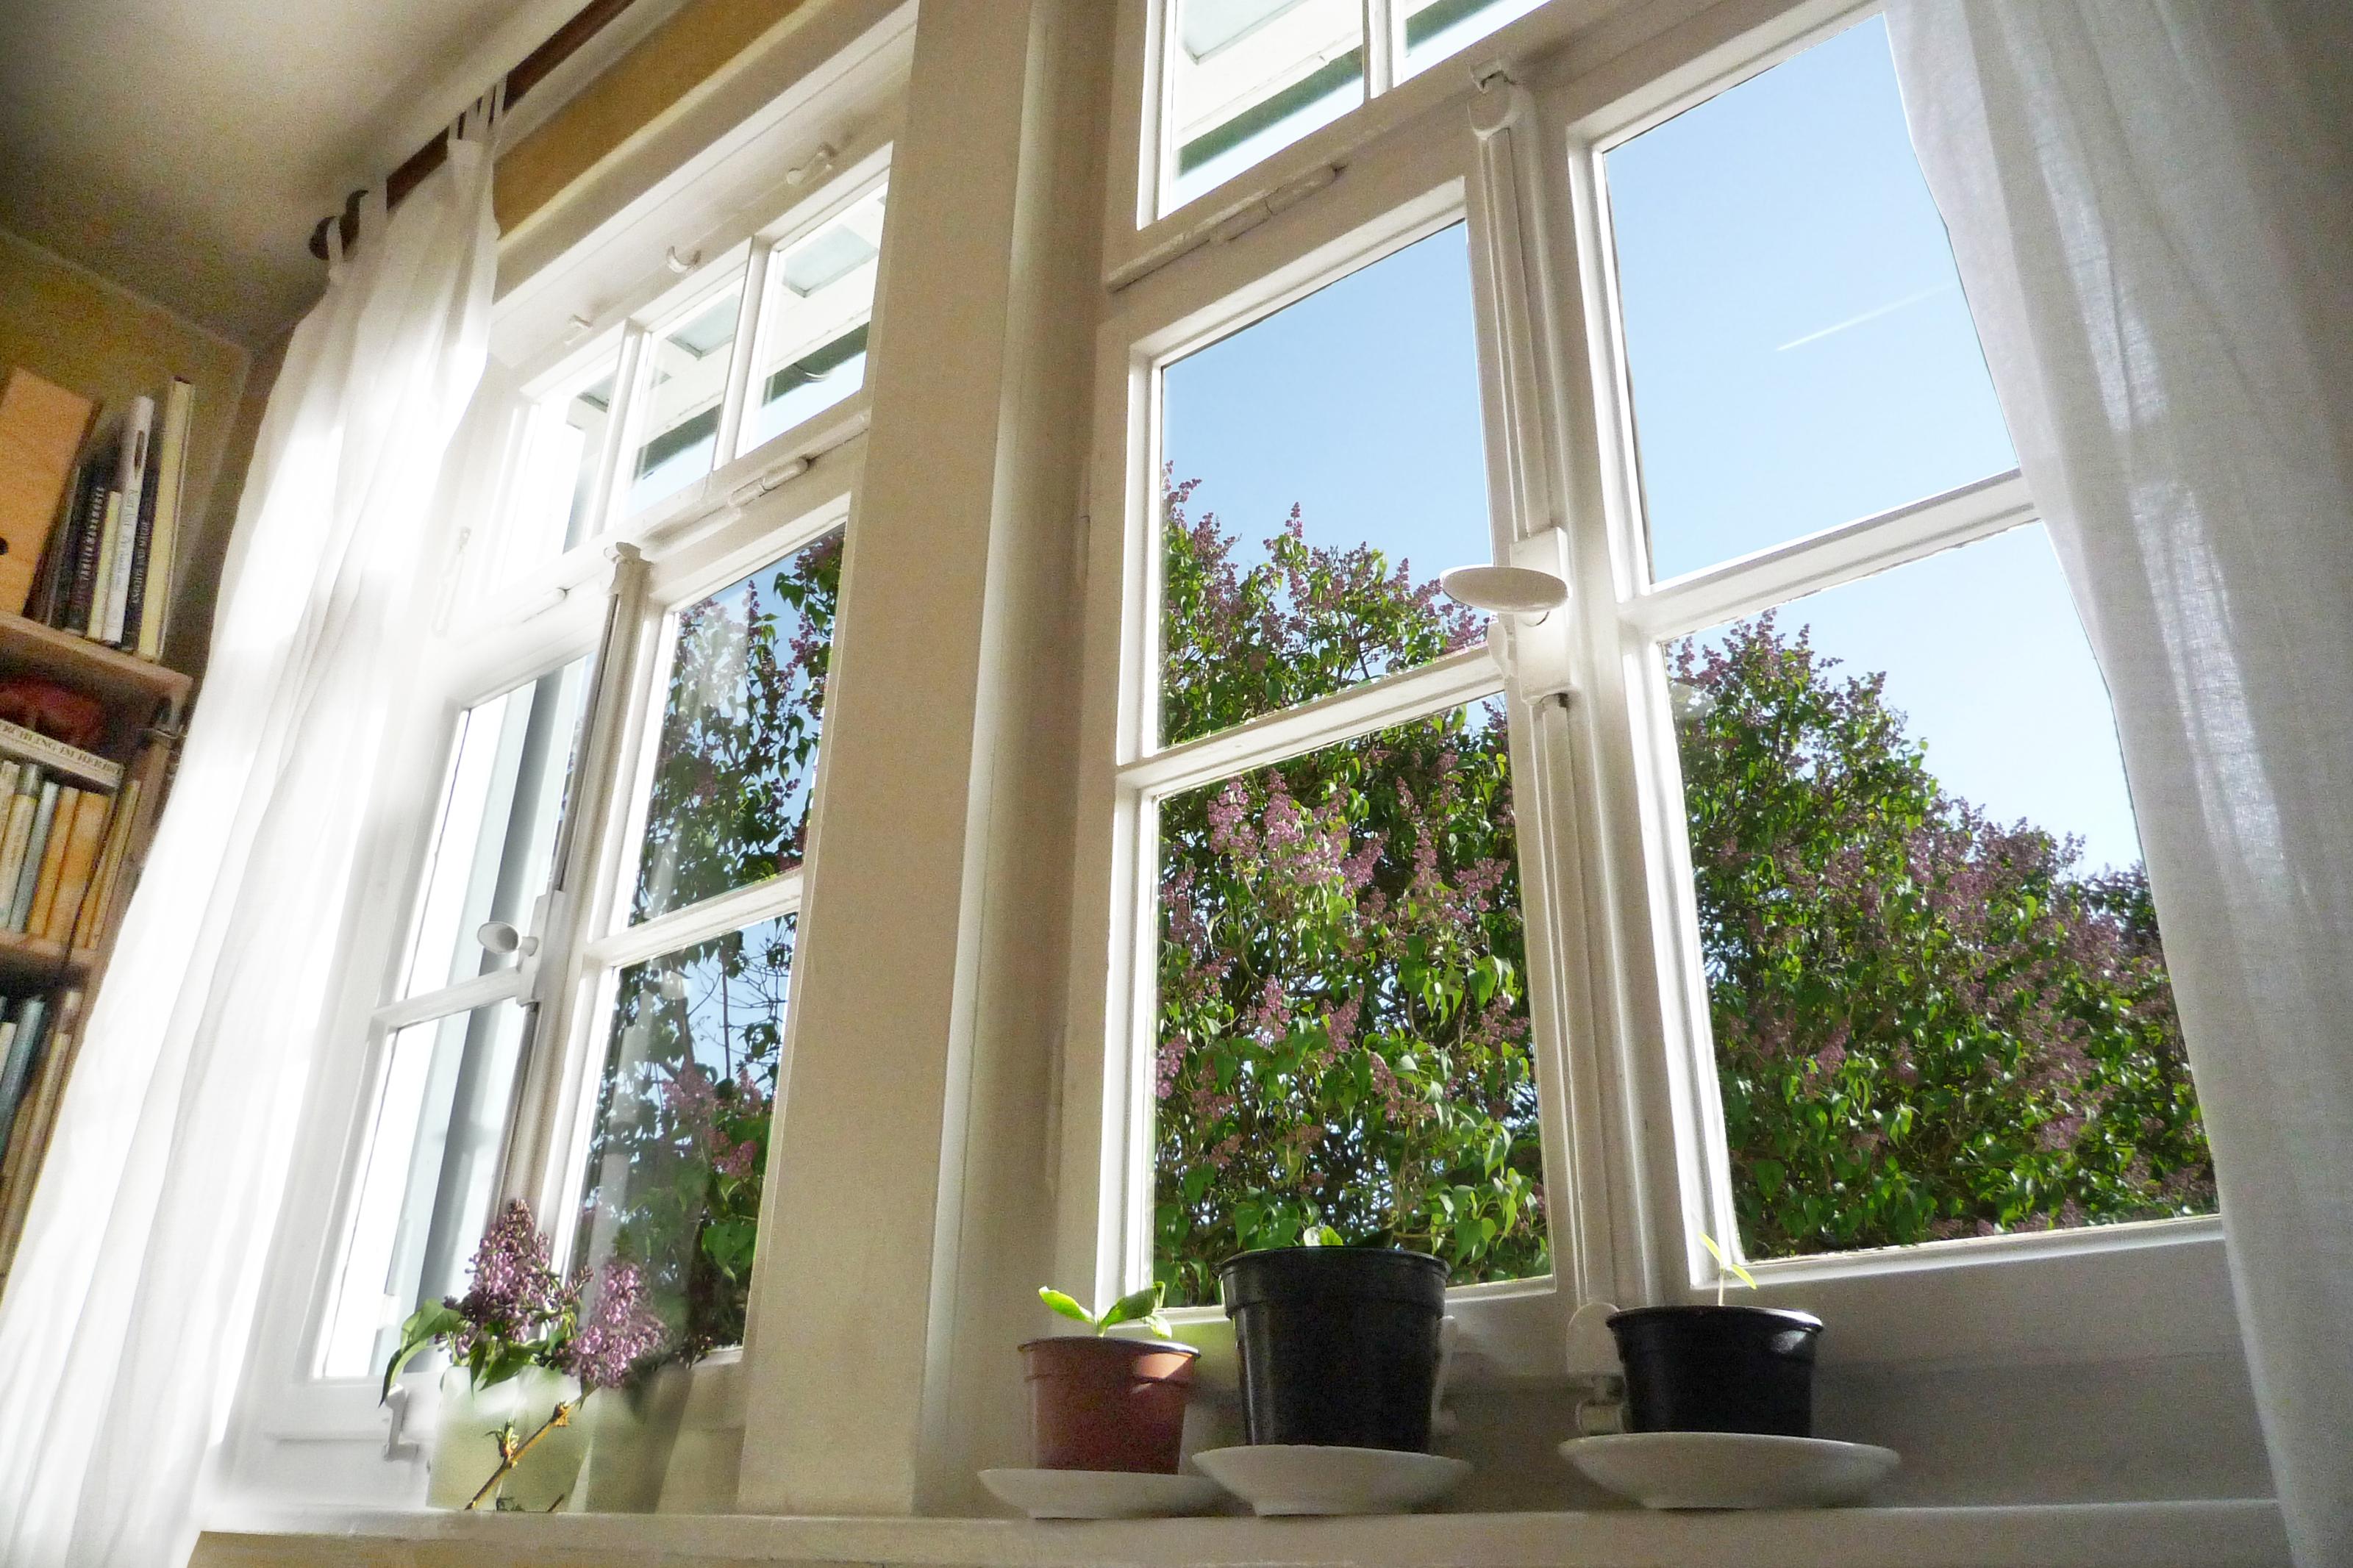 A sunny window in the springtime